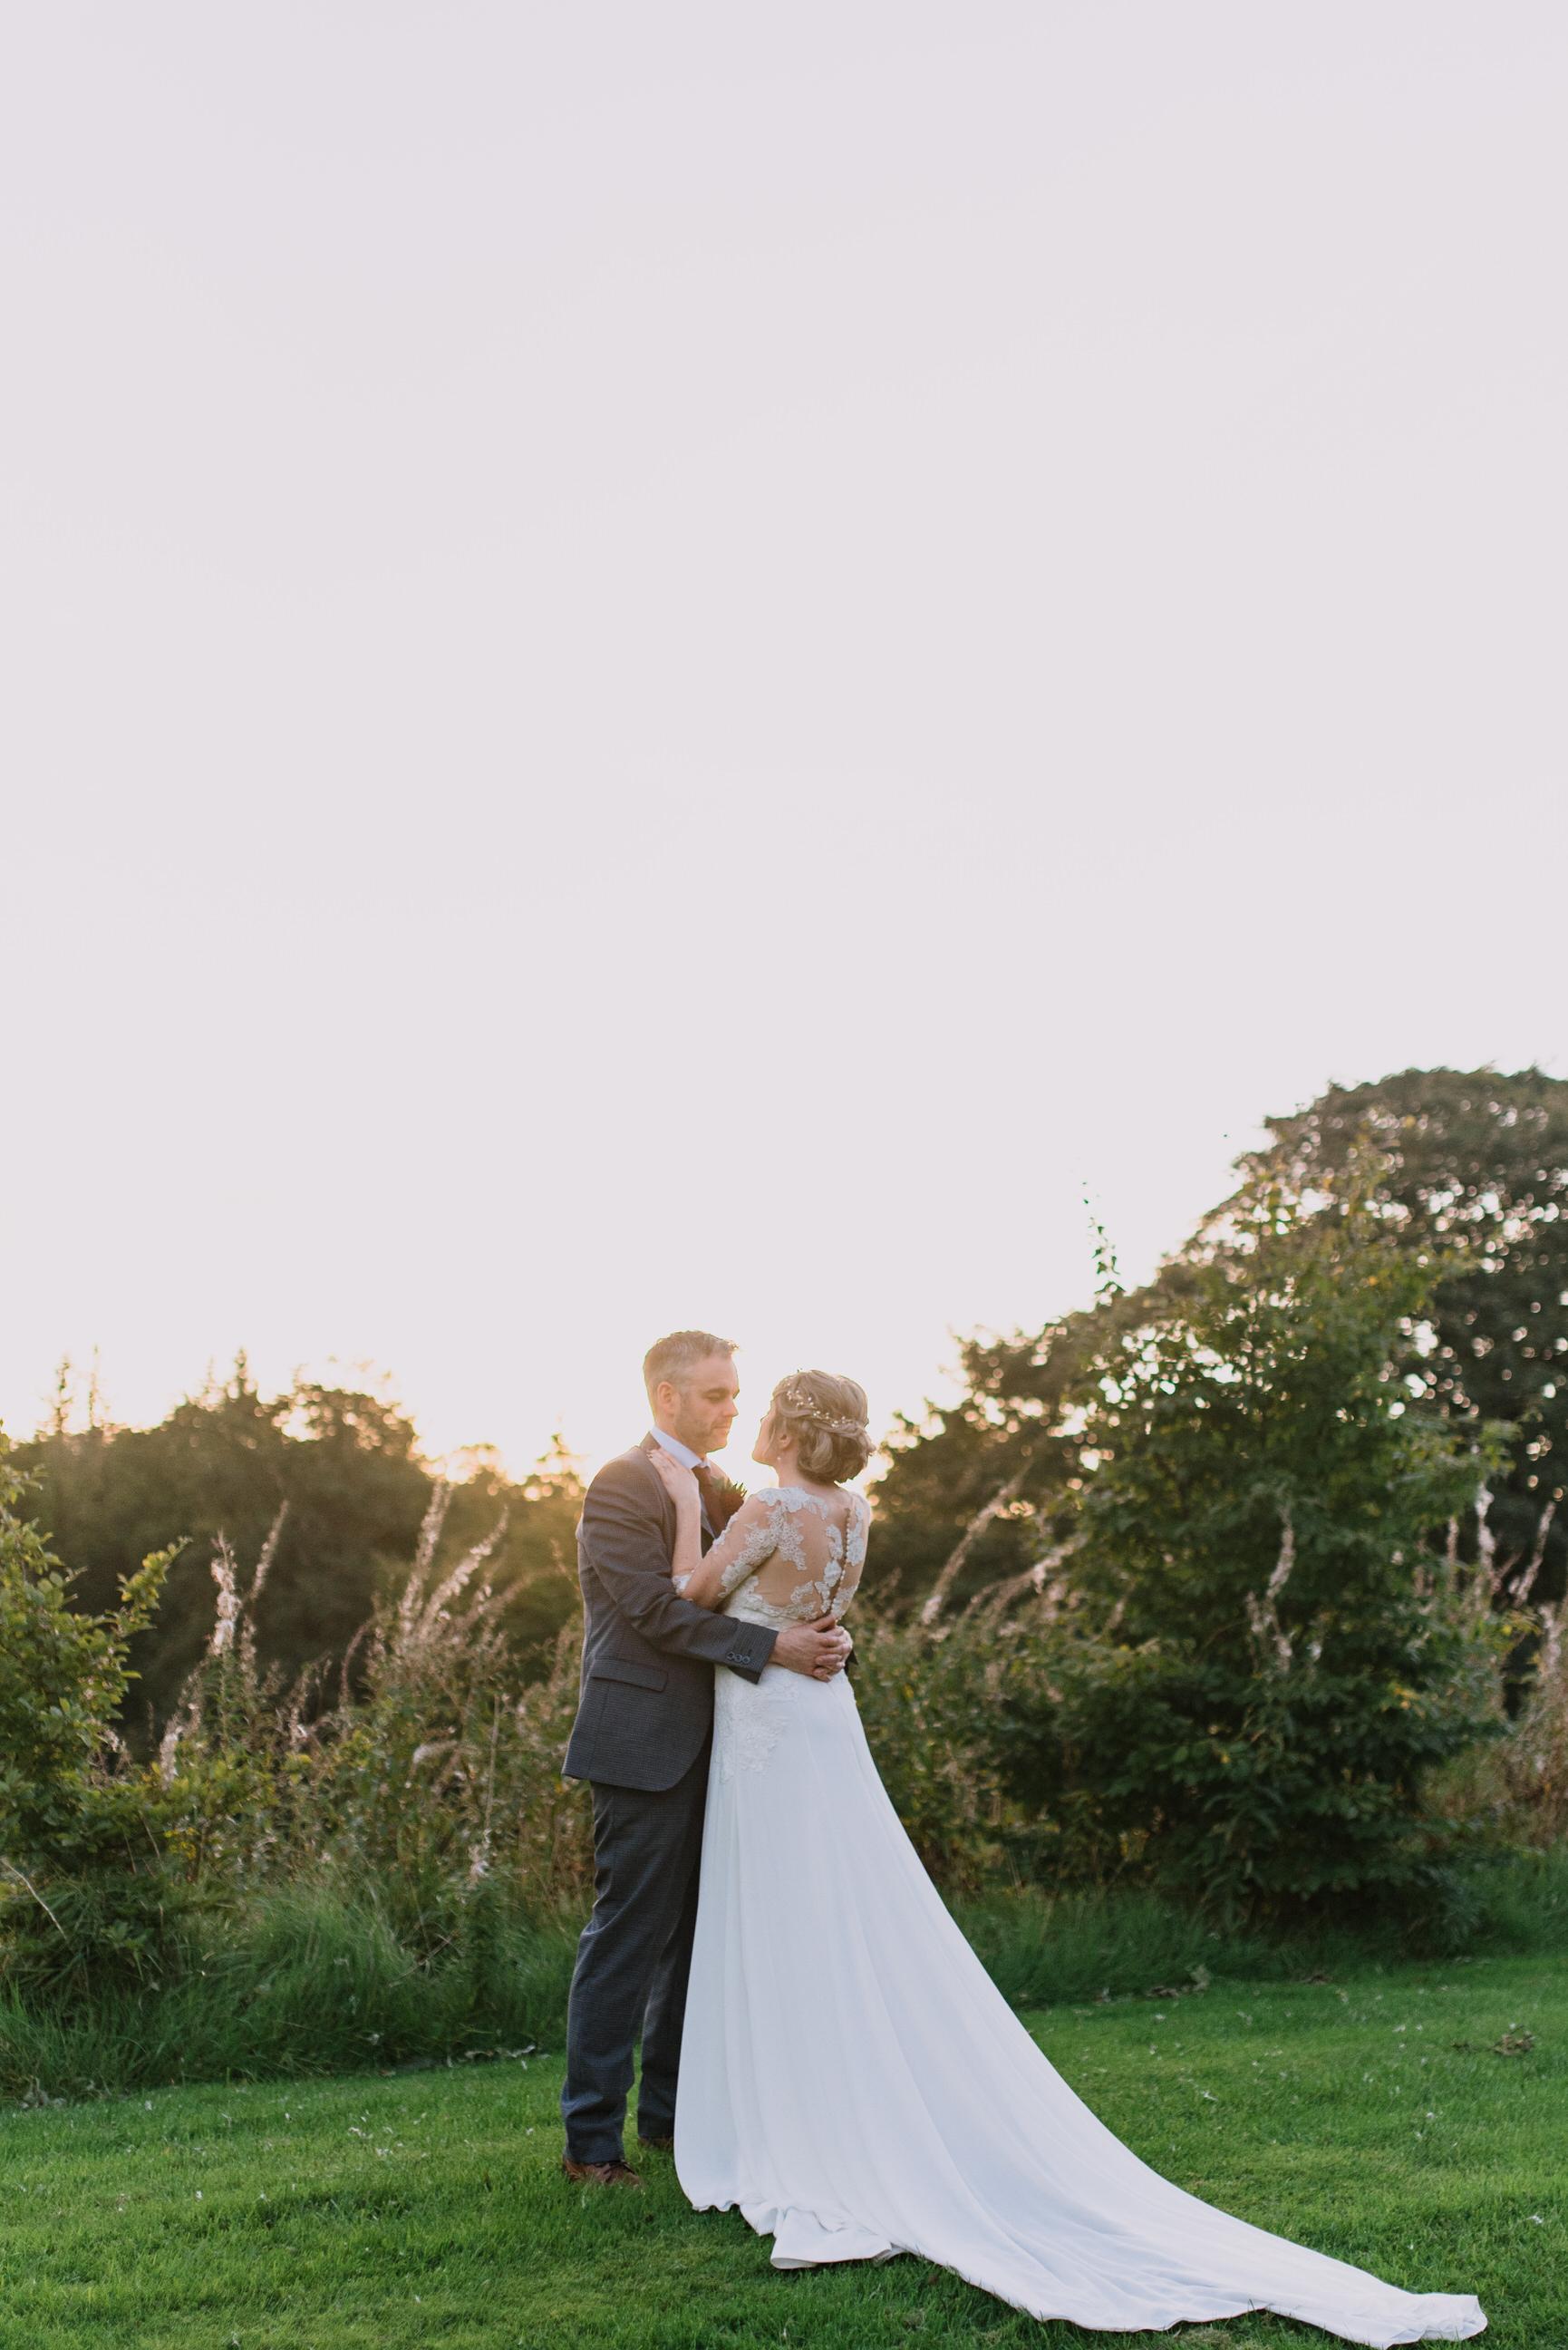 lissanoure castle wedding, northern ireland wedding photographer, romantic northern irish wedding venue, castle wedding ireland, natural wedding photography ni (123).jpg